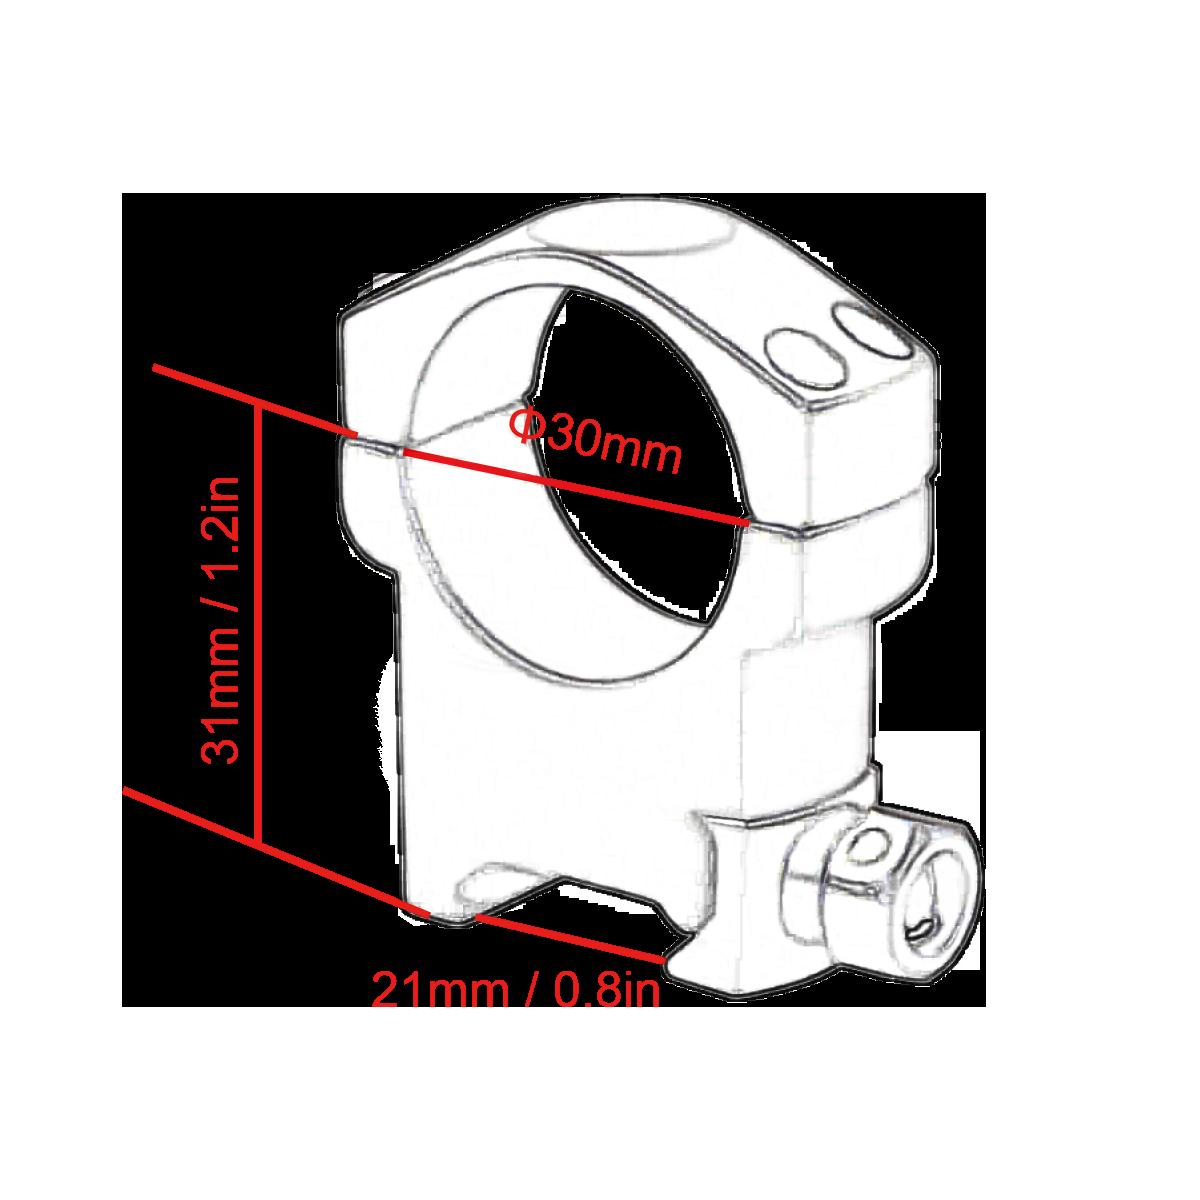 SCTM-08 30mm Mark High Profile Weaver Rings Diagram